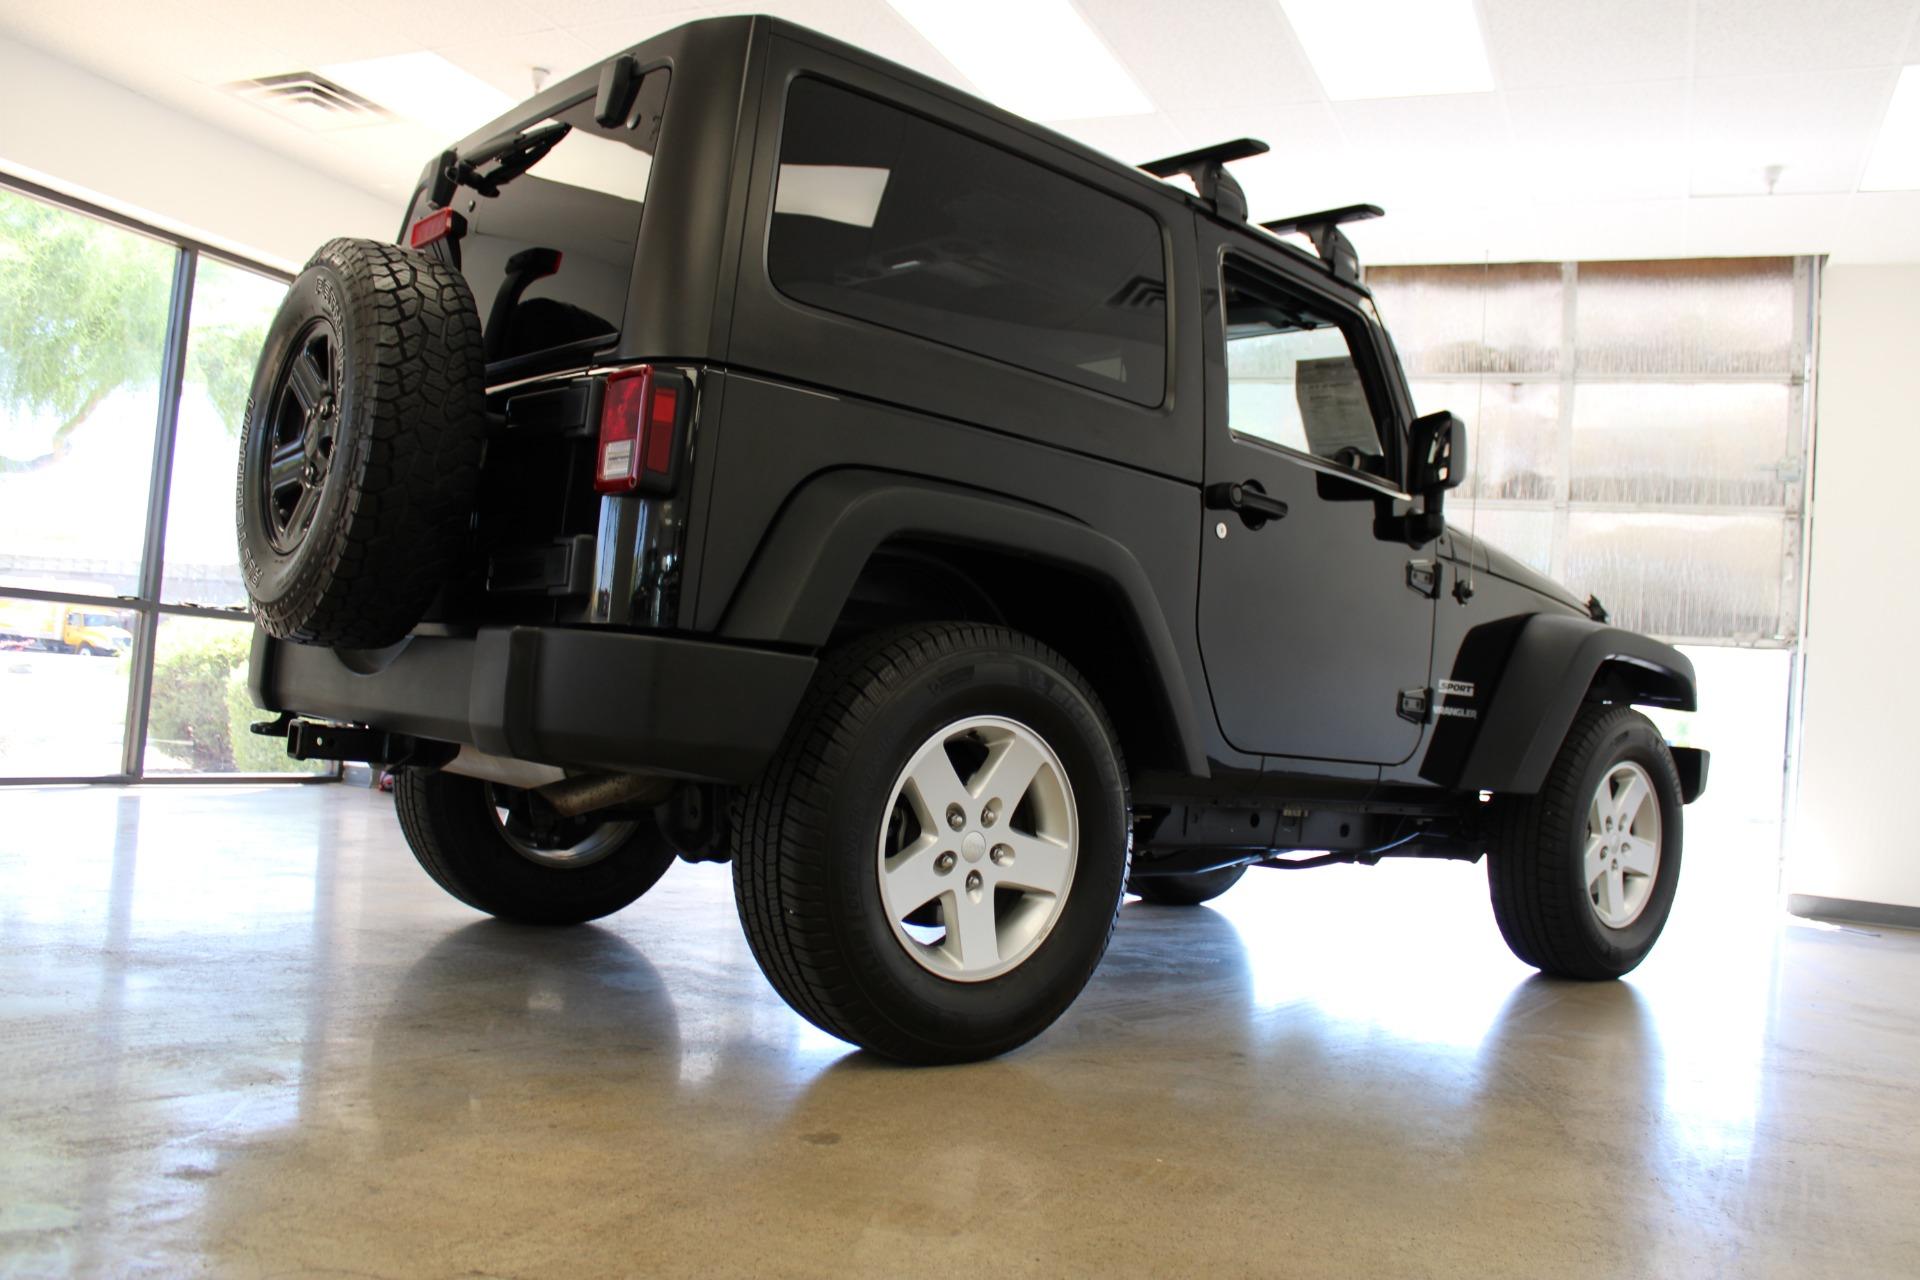 Used-2015-Jeep-Wrangler-Sport-LS400